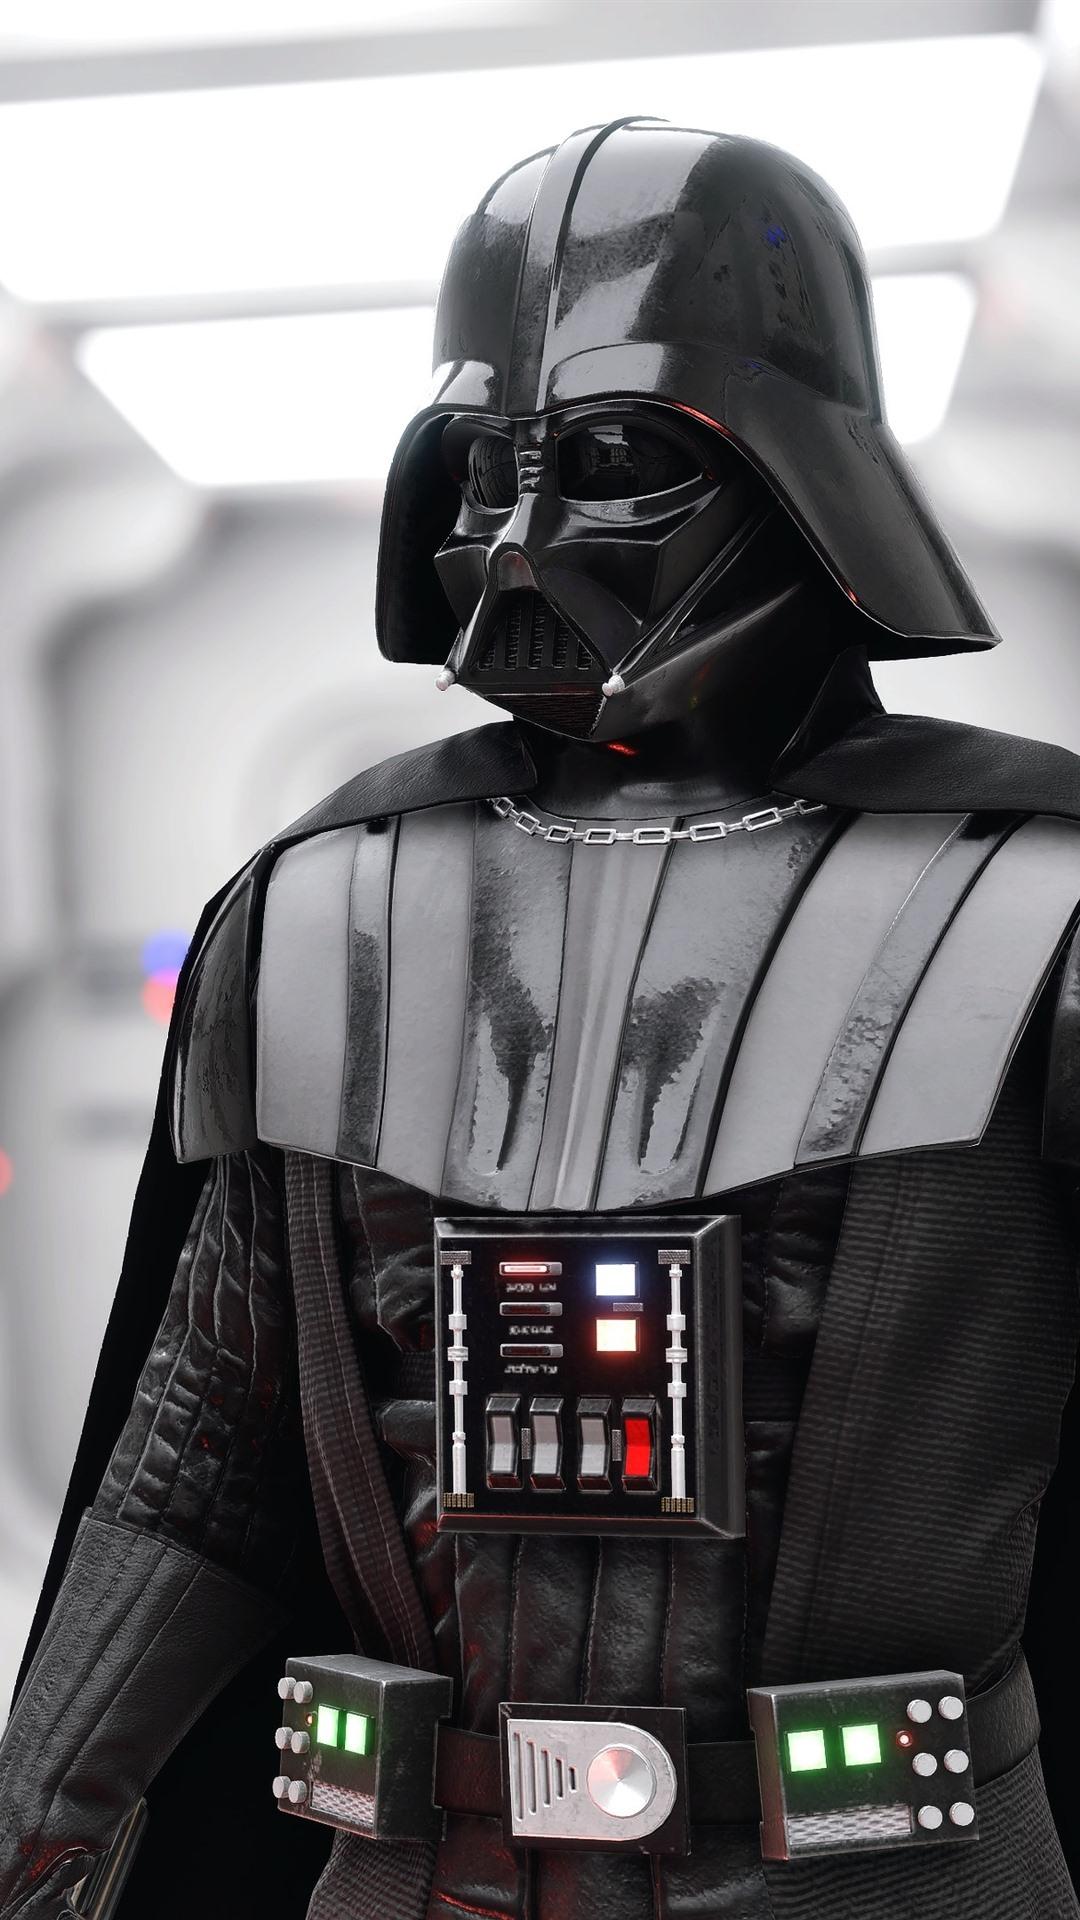 Iphone Wallpaper Darth Vader Star Wars Darth Vader Battlefront 2 1080x1920 Download Hd Wallpaper Wallpapertip